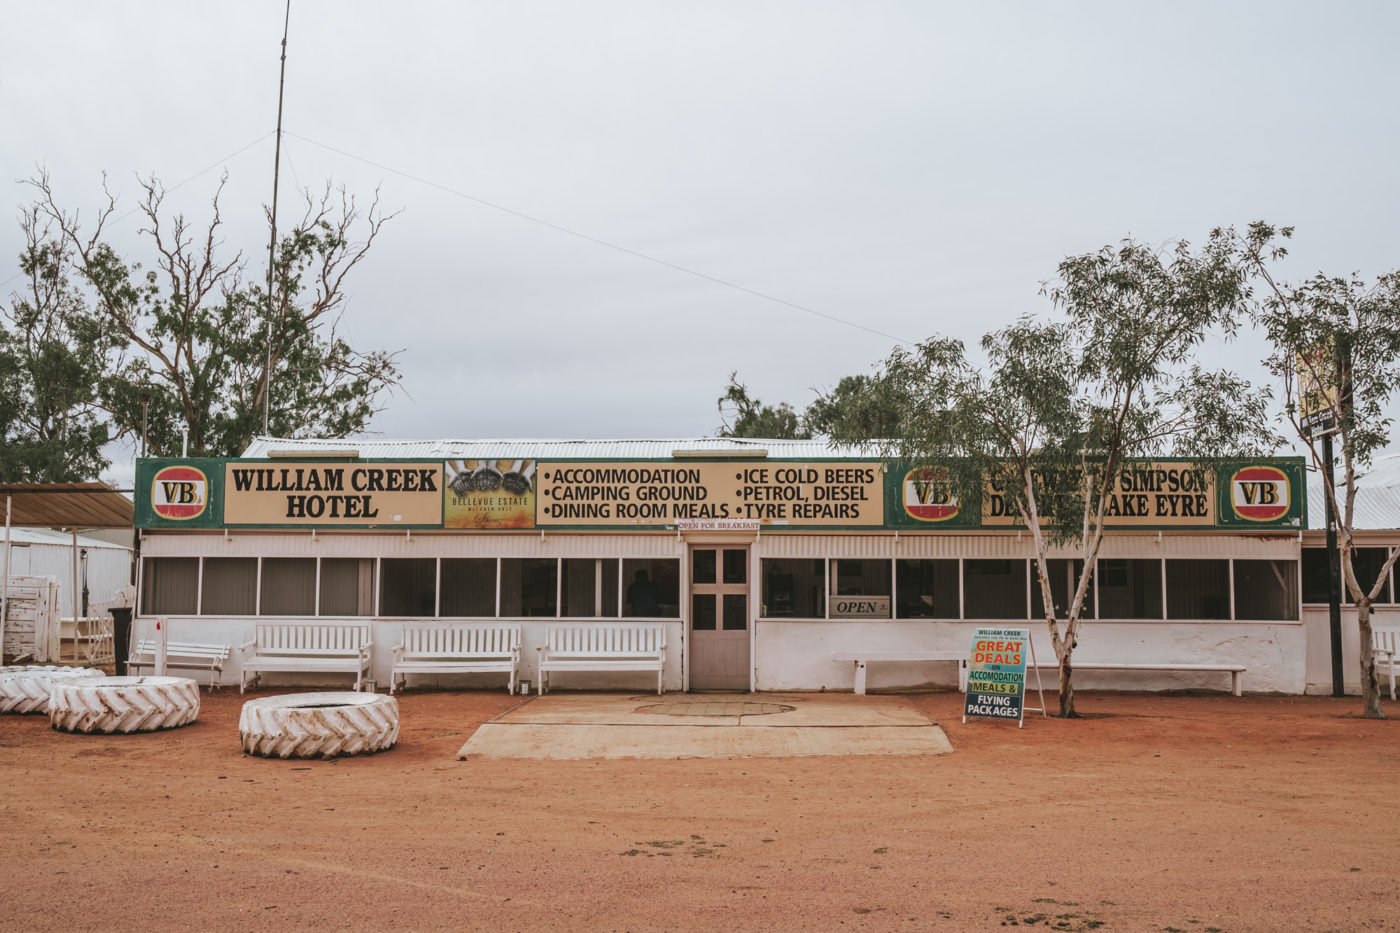 william creek hotel, oodnadatta track